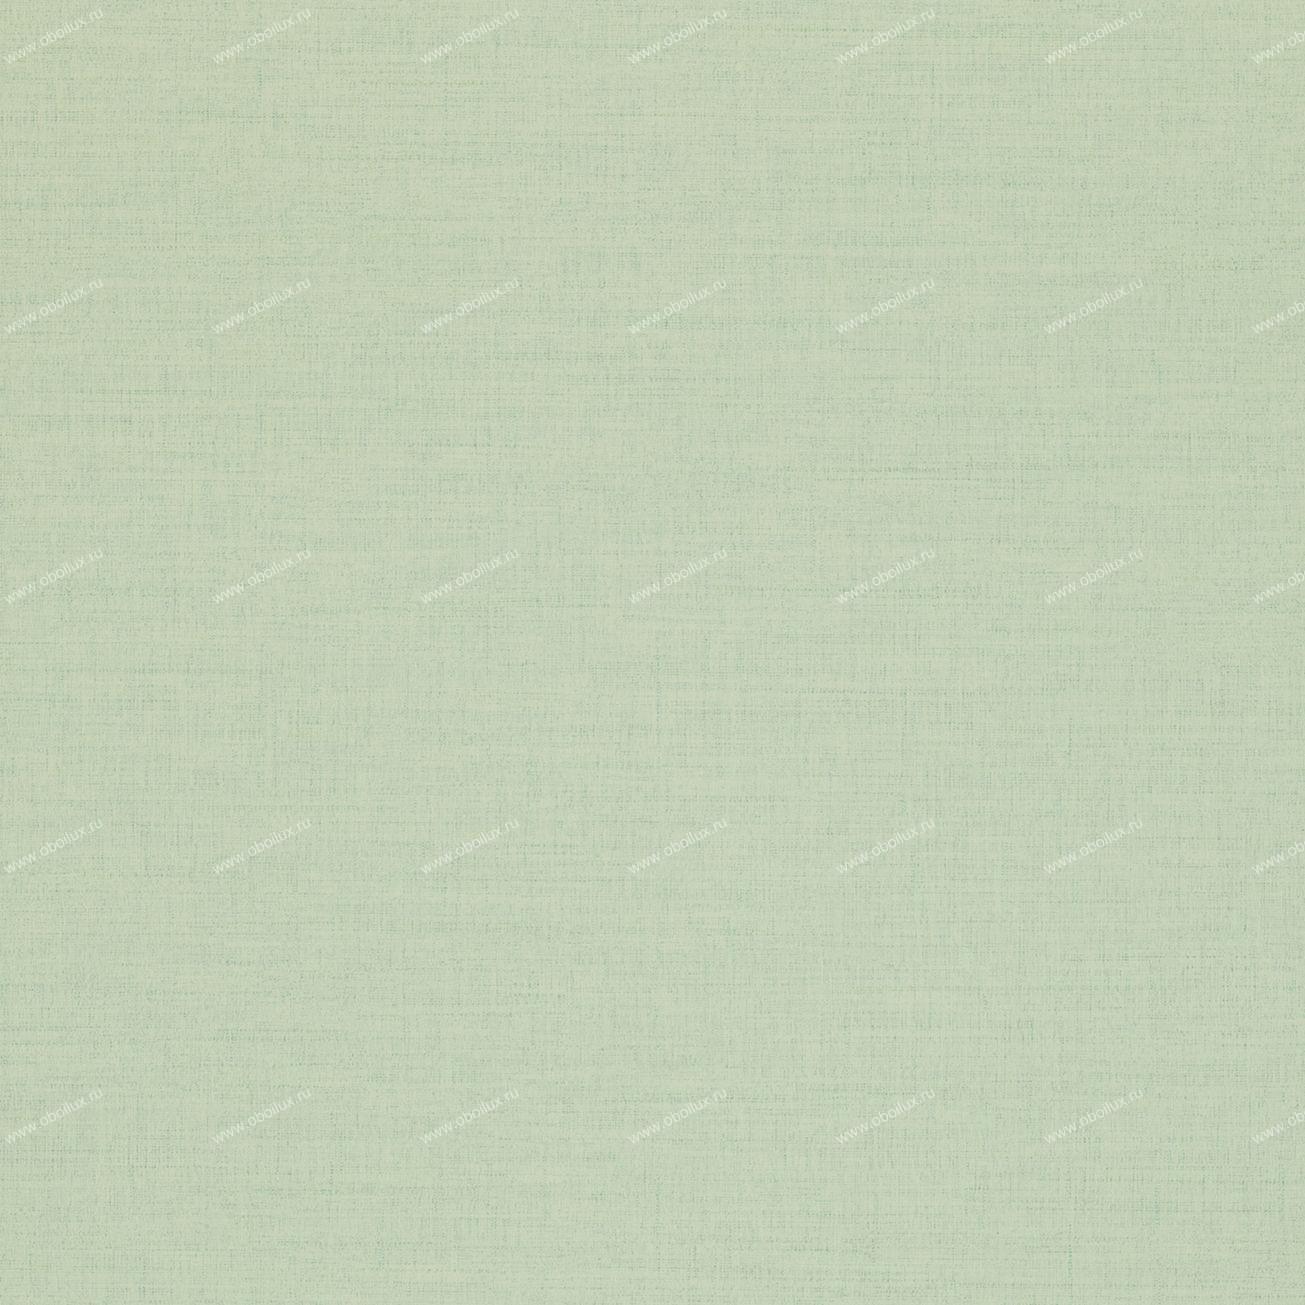 Английские обои Sanderson,  коллекция Colour for Living, артикул211682